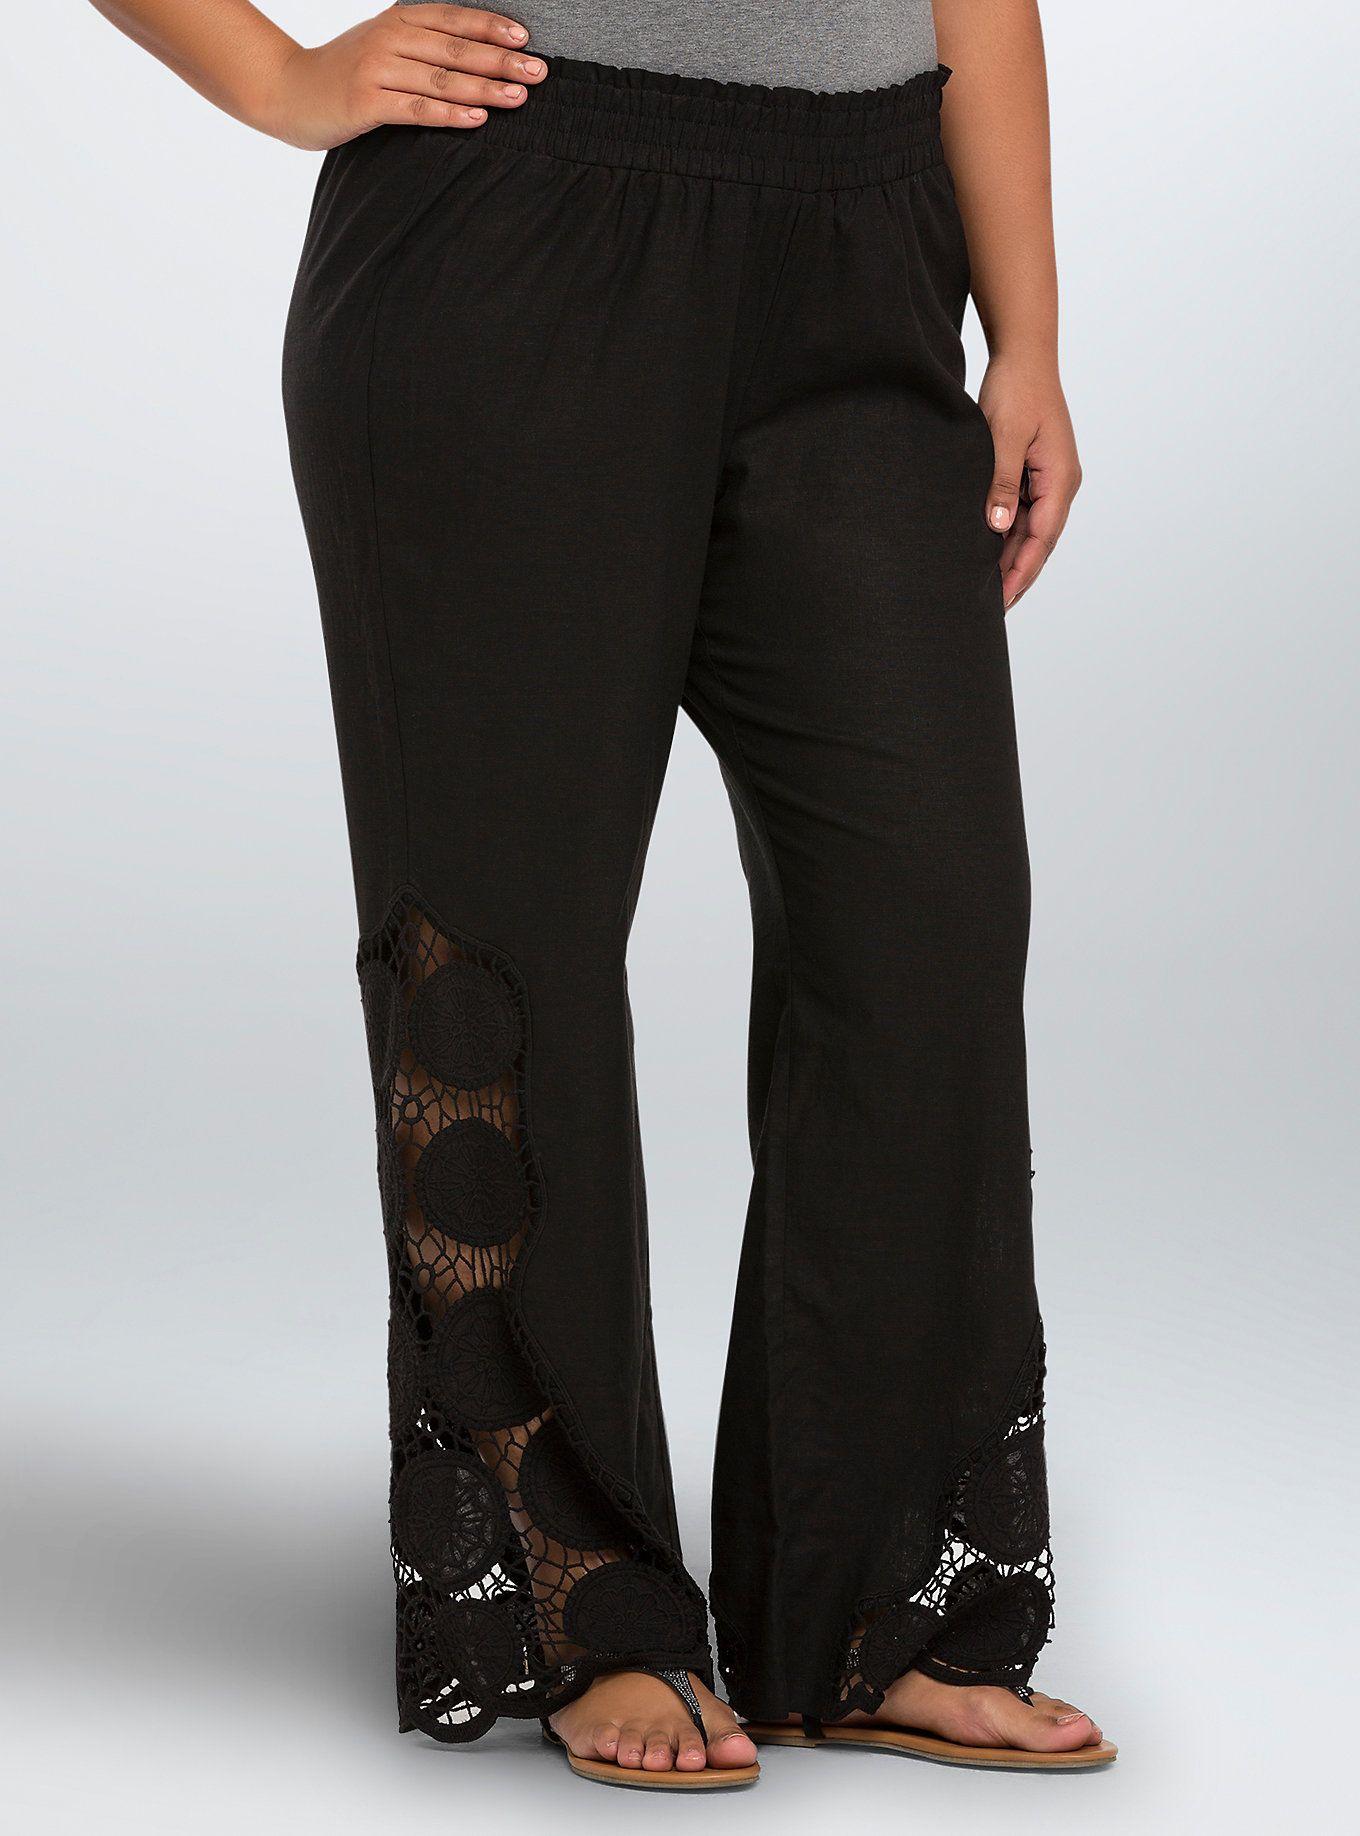 aad87e5c1f3f Crochet Beach Pants | Women's Fashion | Beach pants, Pants, Black ...